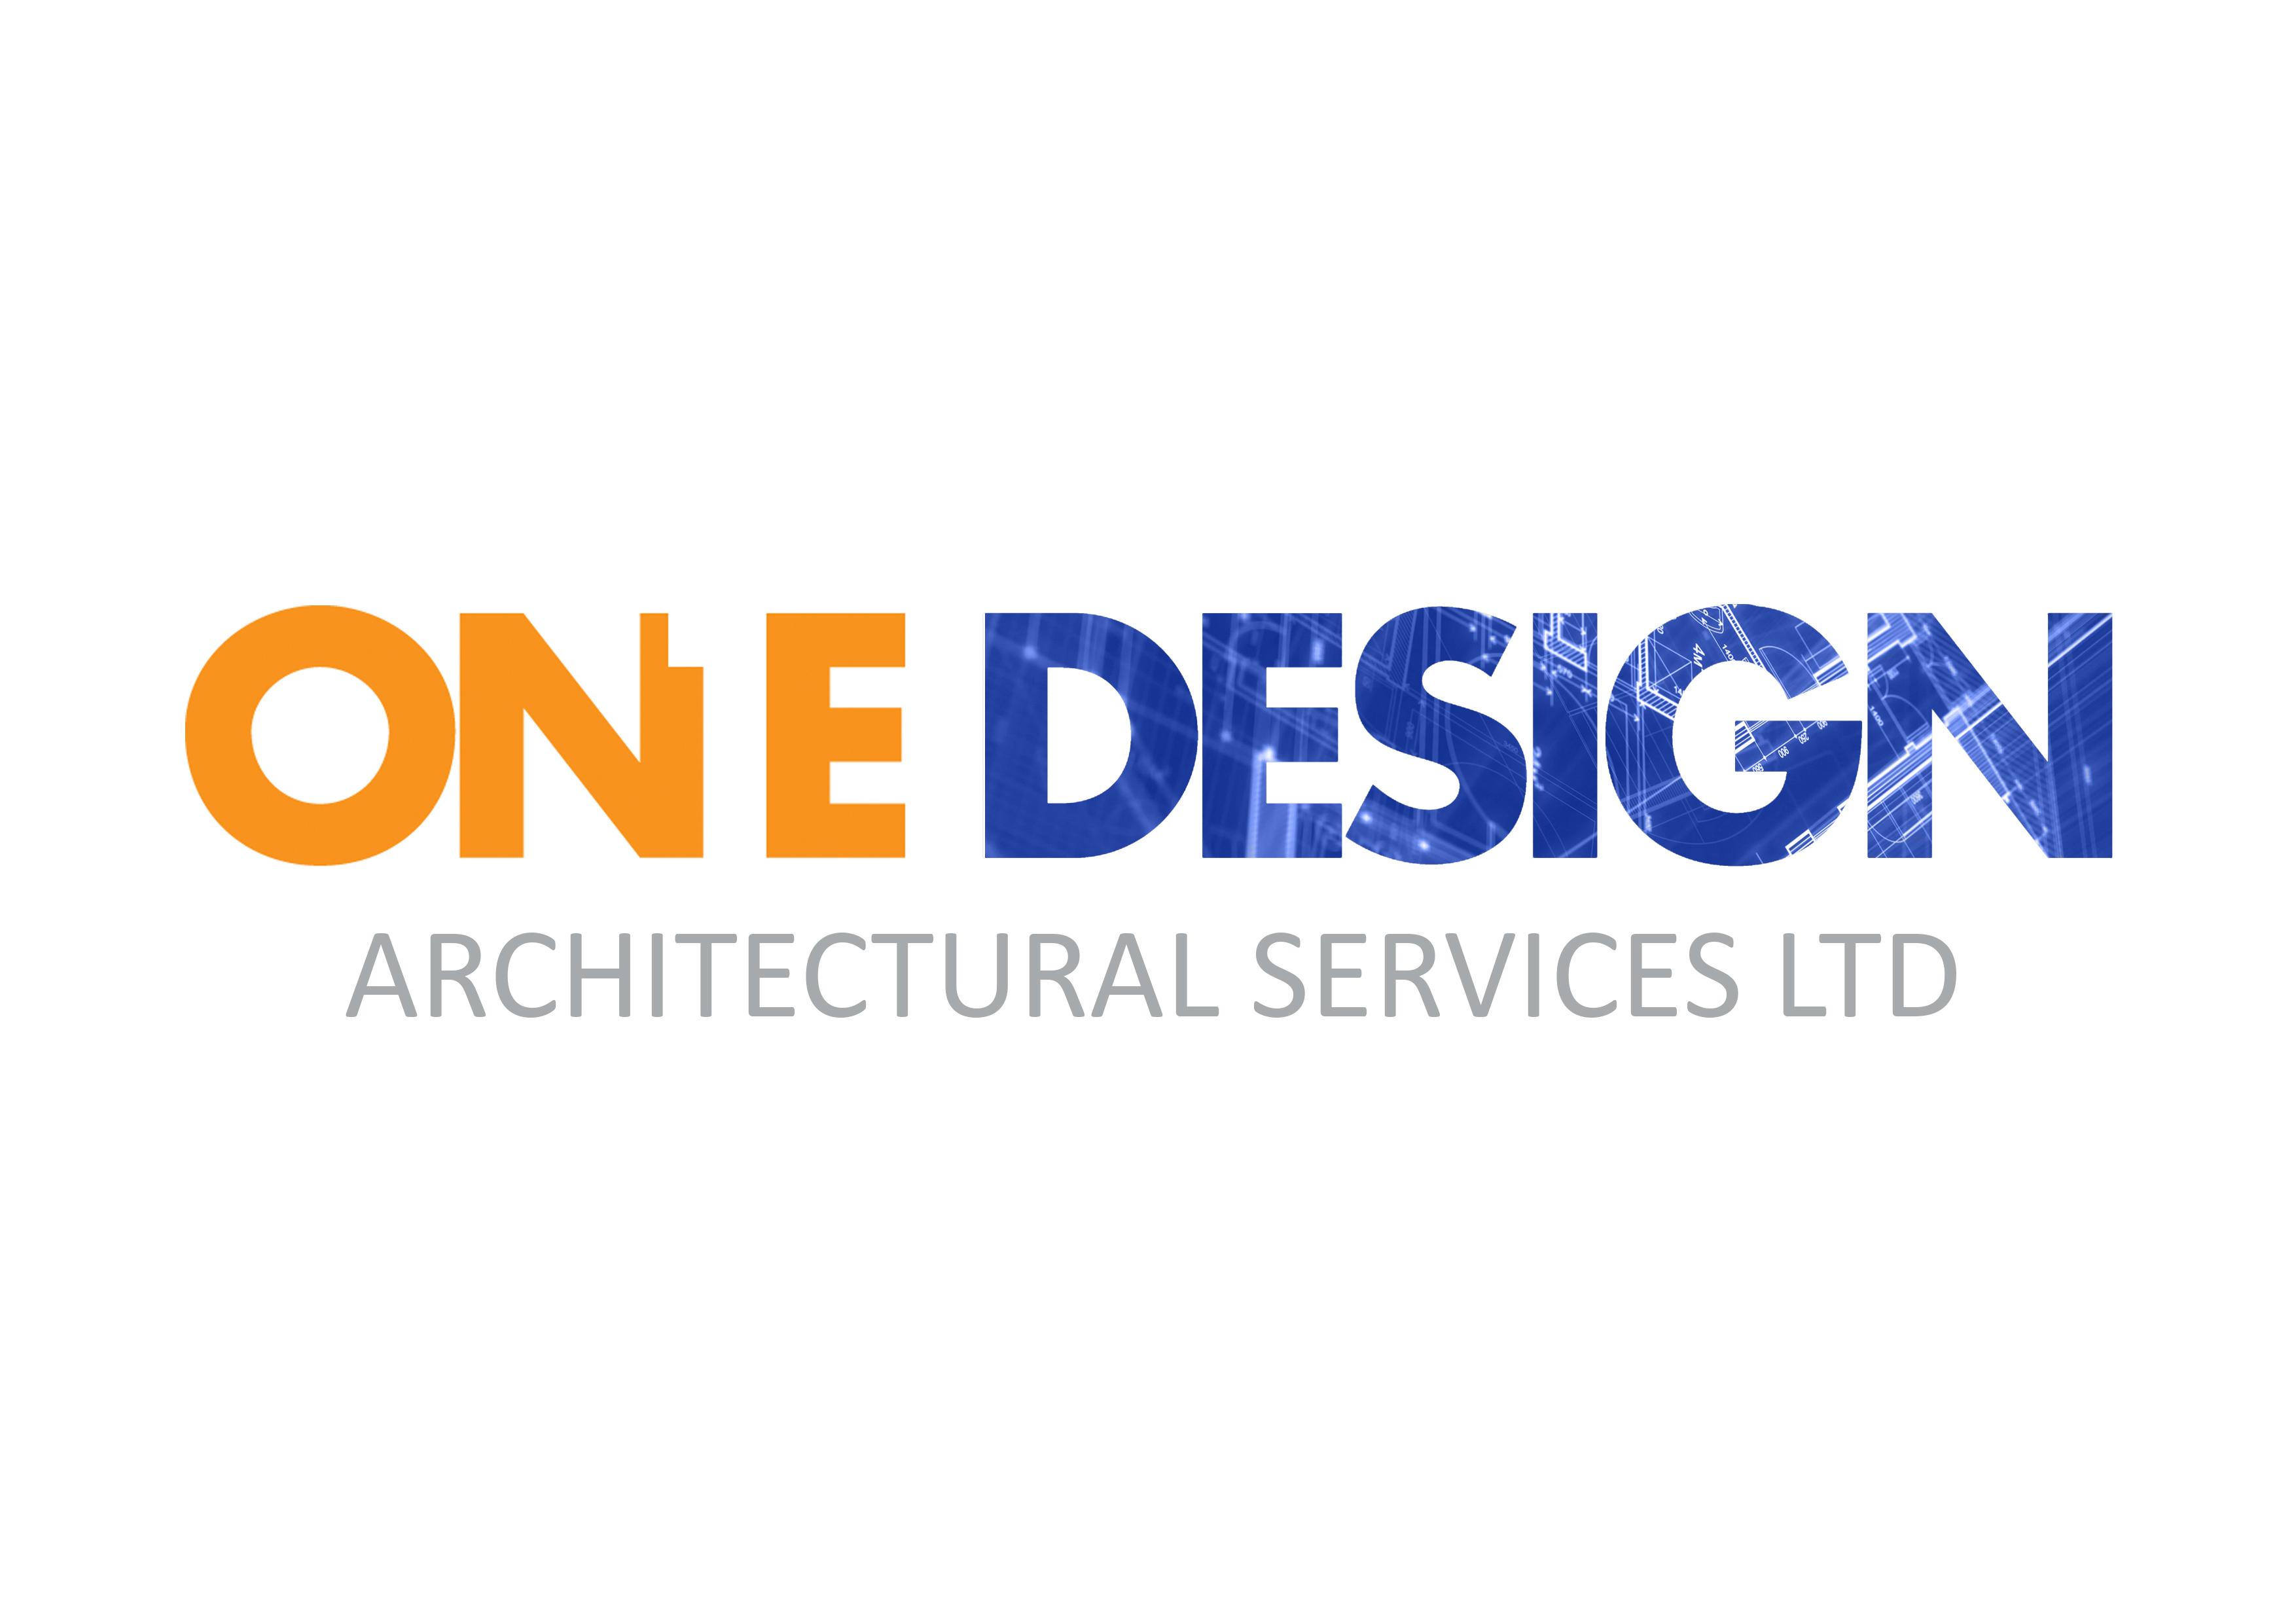 2019 ONE DESIGN ARCHITECTURAL SERVICES L